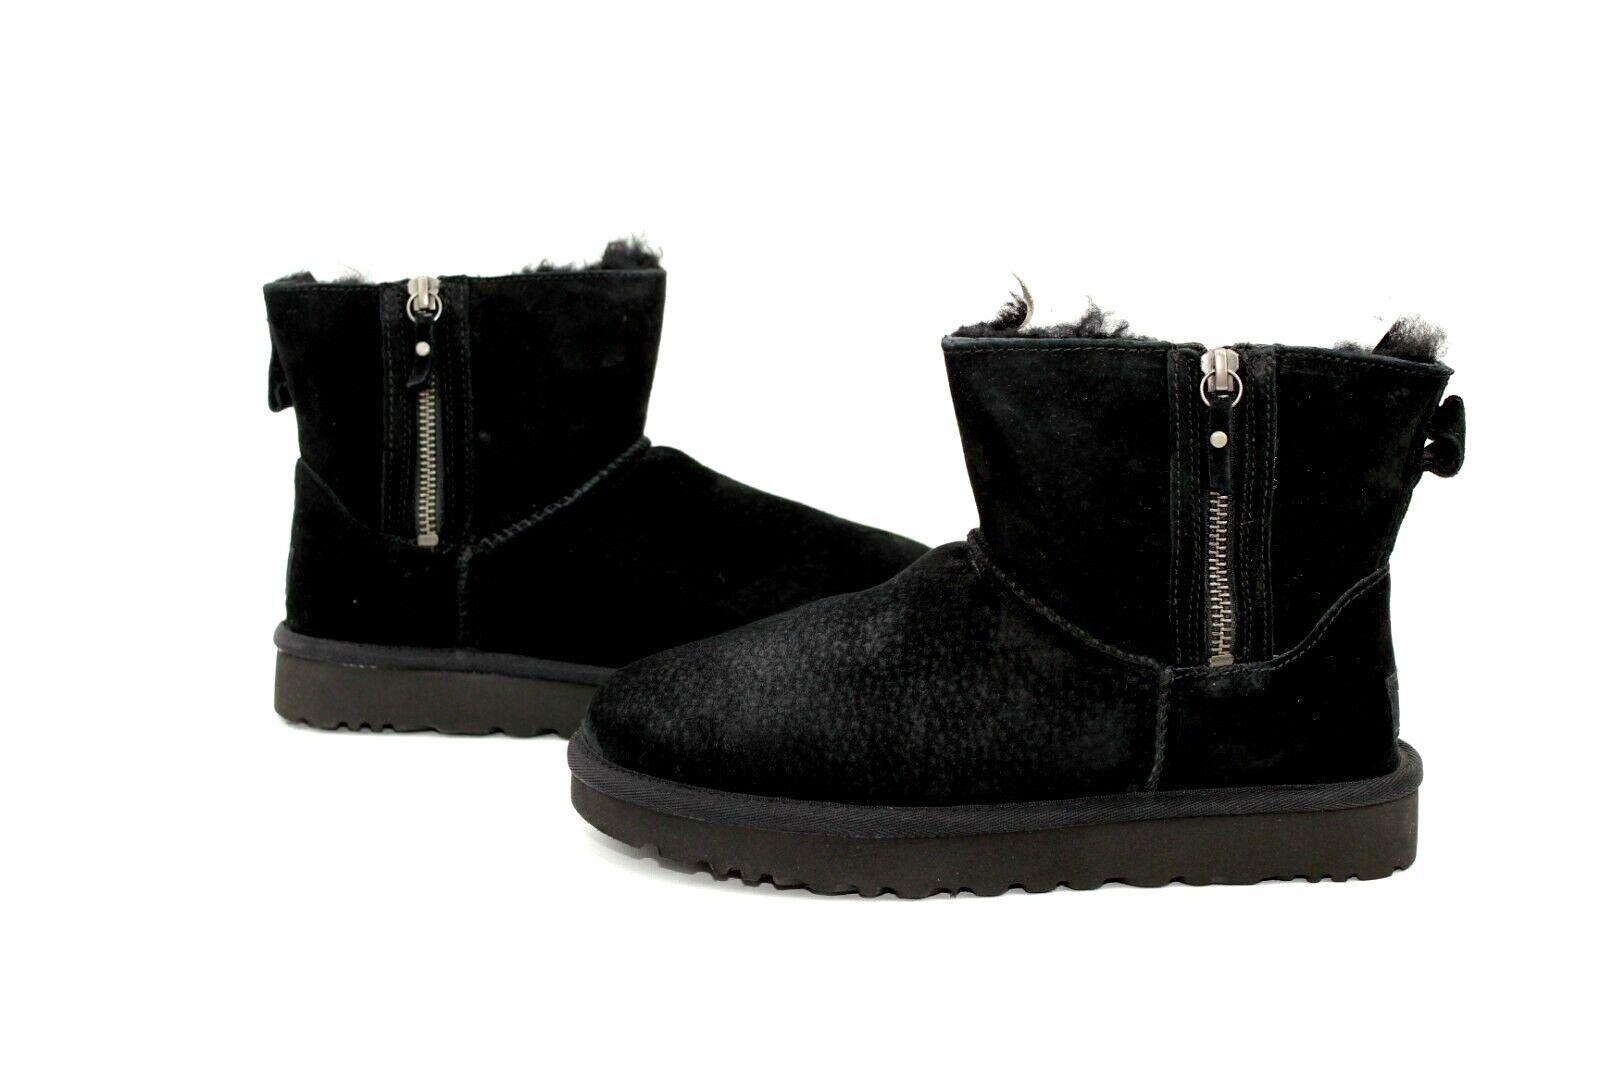 69710f64026 UGG Classic Mini Double Zip Black Suede Sheepskin BOOTS Womens Size 6 US